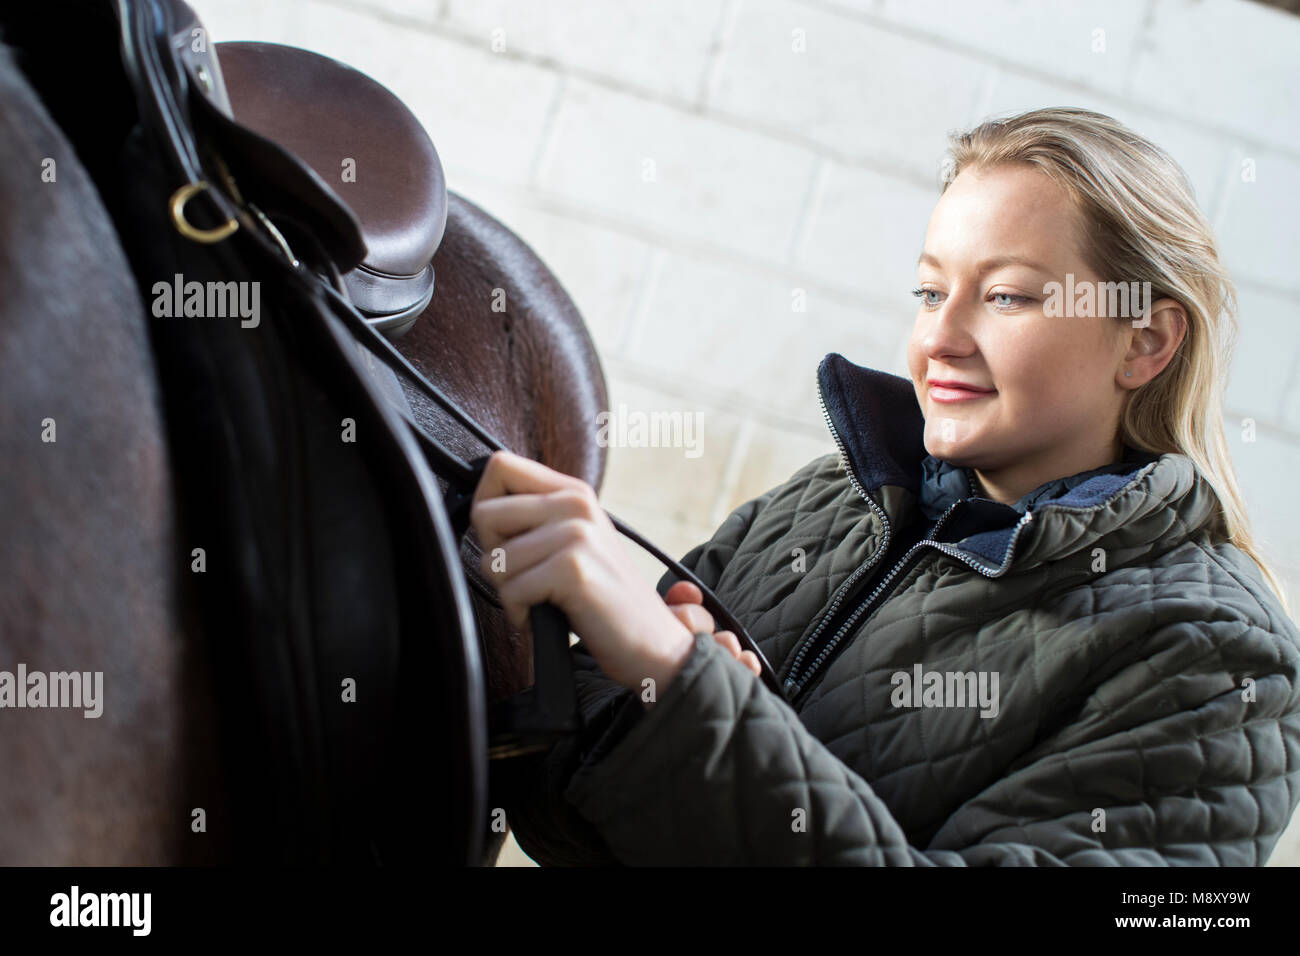 Hembra propietario ajuste las correas en caballete estable a caballo Imagen De Stock